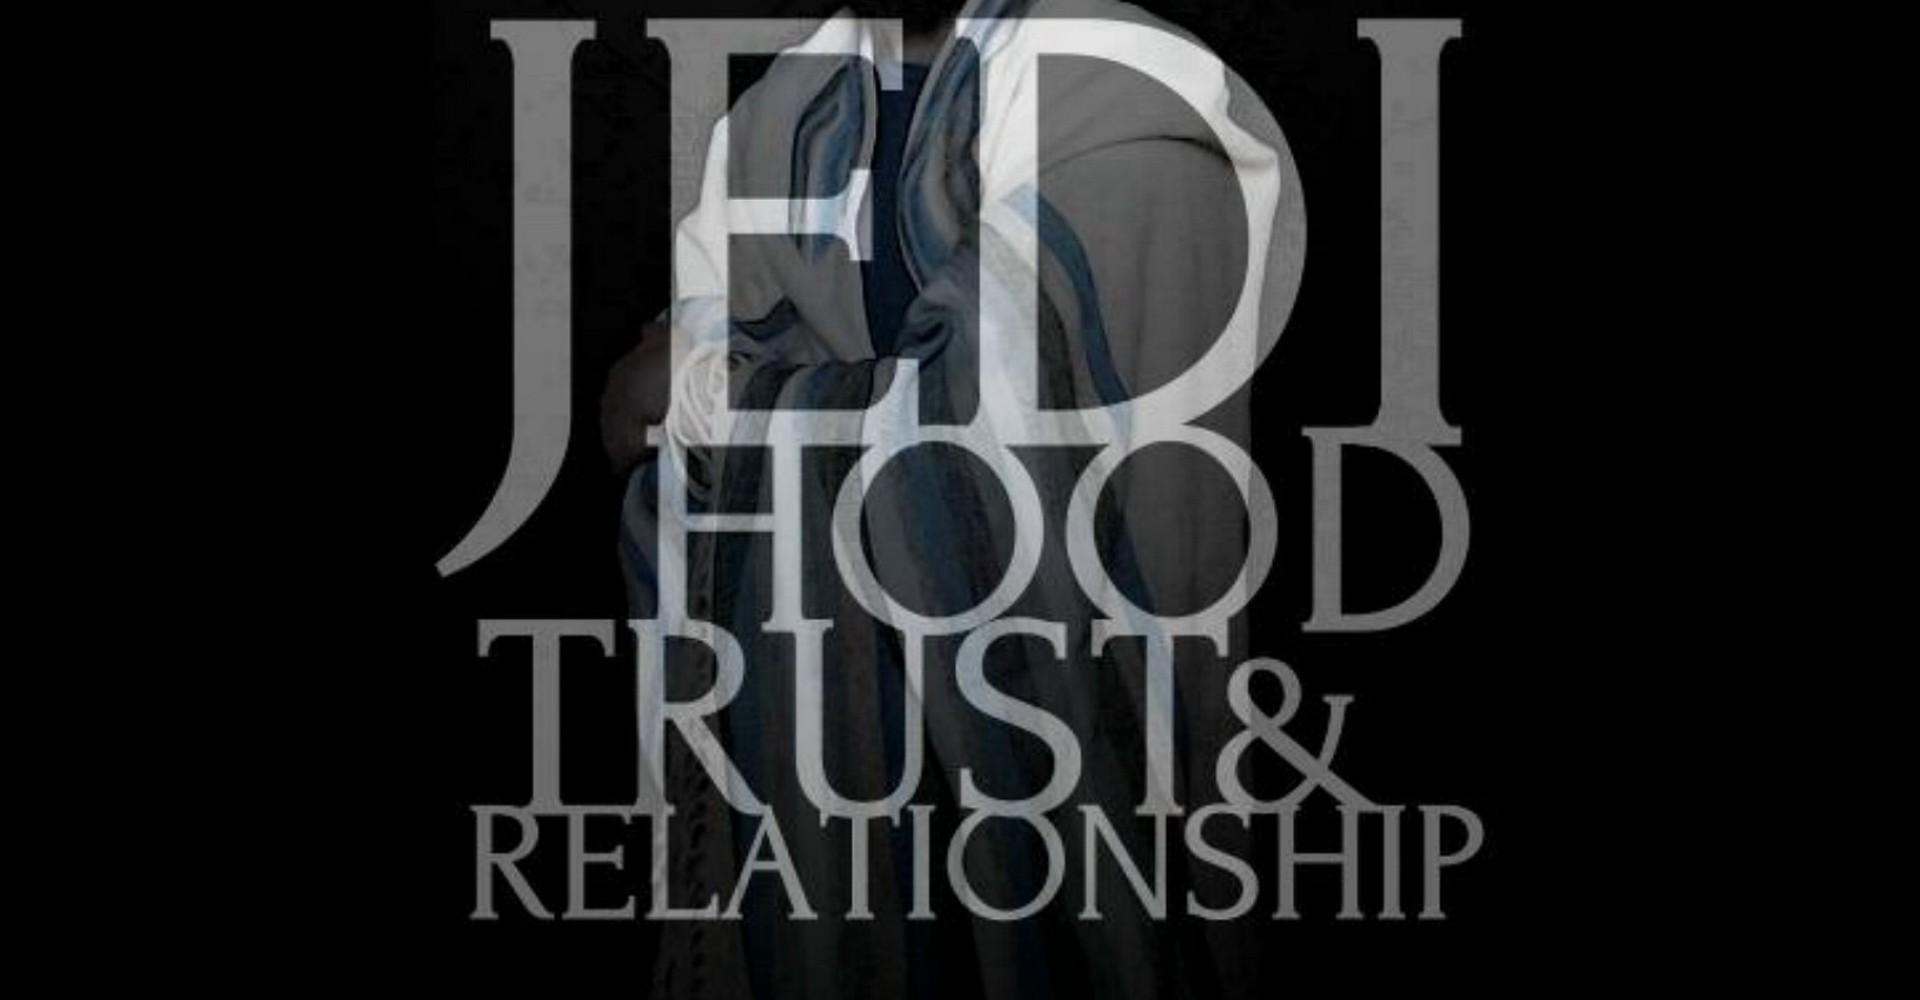 Jedihood Series Background